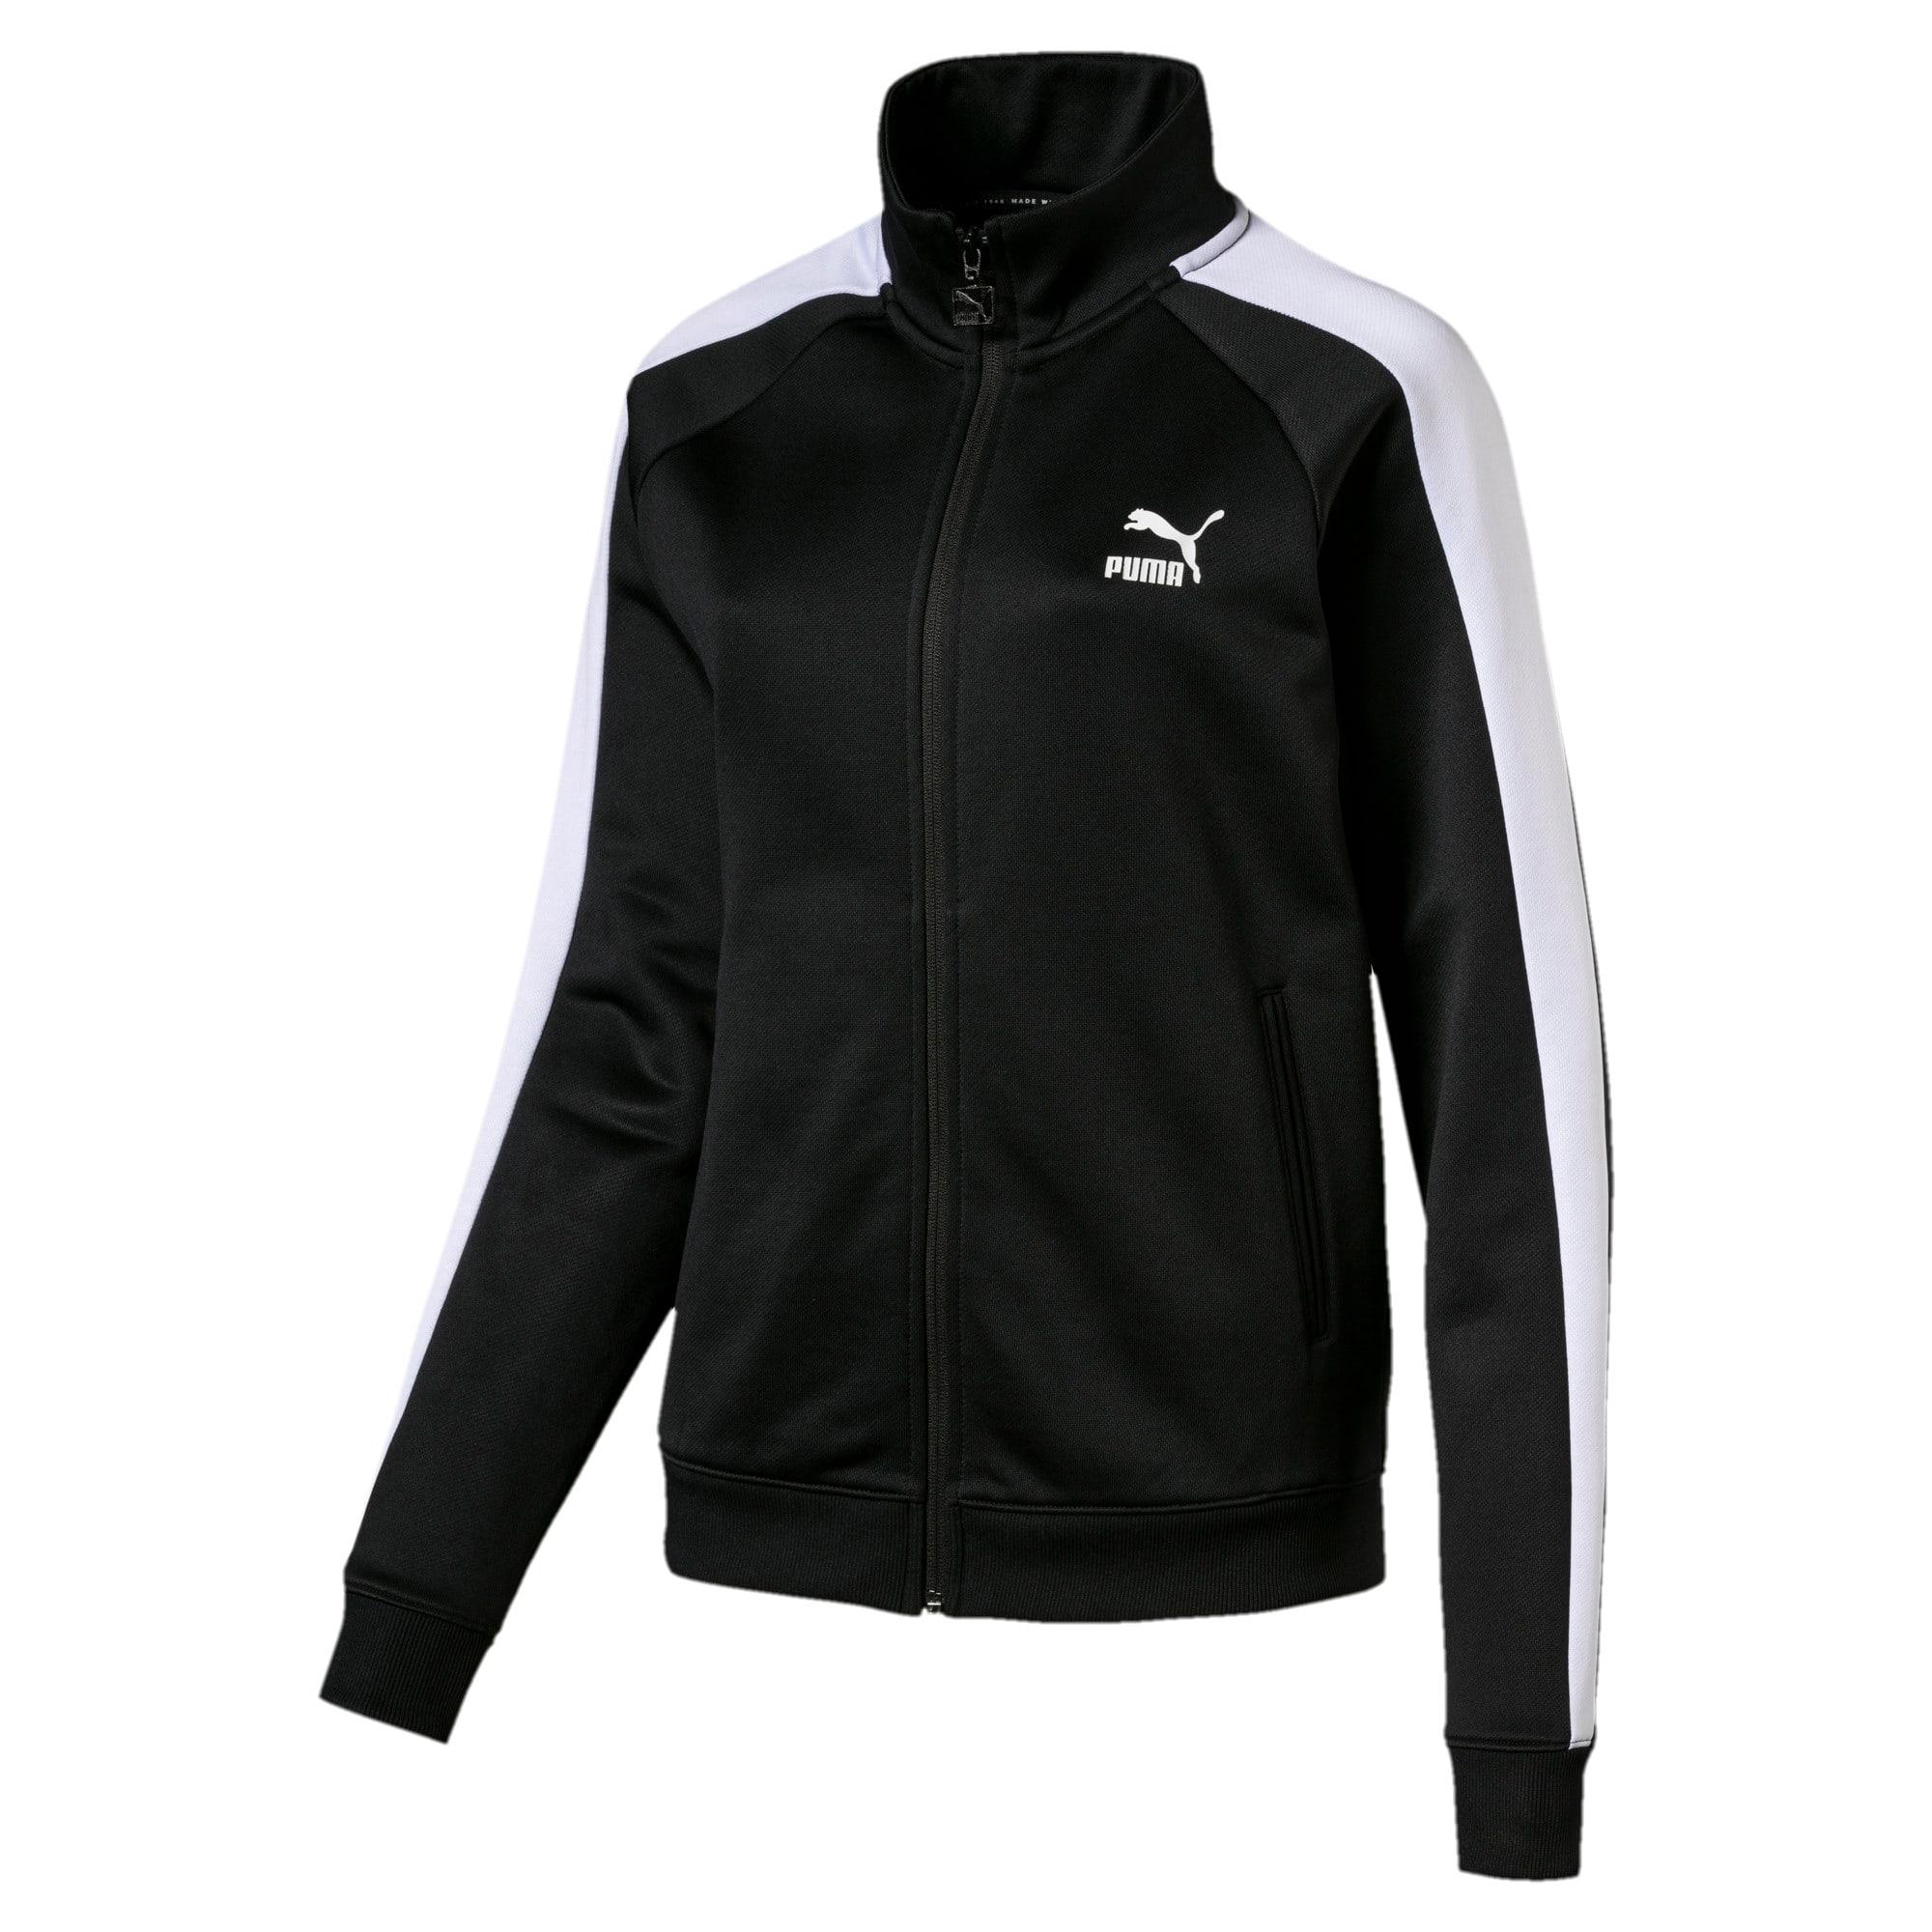 Thumbnail 1 of Classics Women's T7 Track Jacket, Puma Black, medium